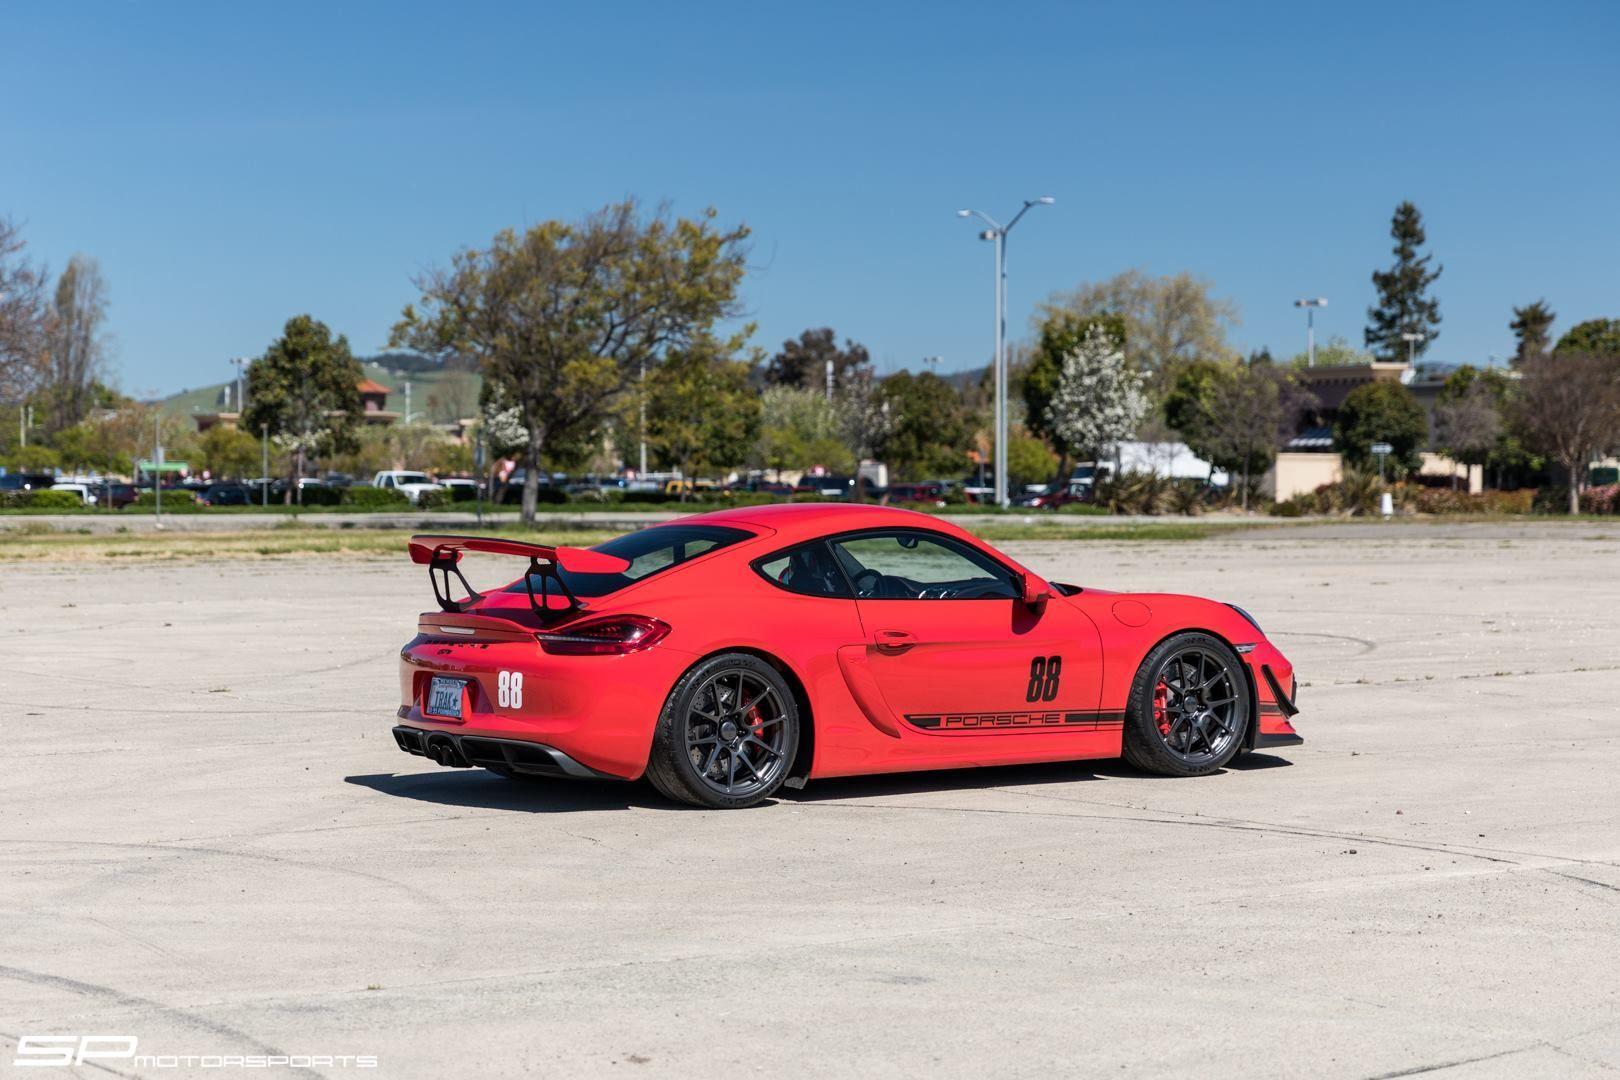 2016 Porsche Cayman | Steve's SP Motorsports Guards Red Porsche Cayman GT4 on Forgeline One Piece Forged Monoblock GA1R Open Lug Wheels